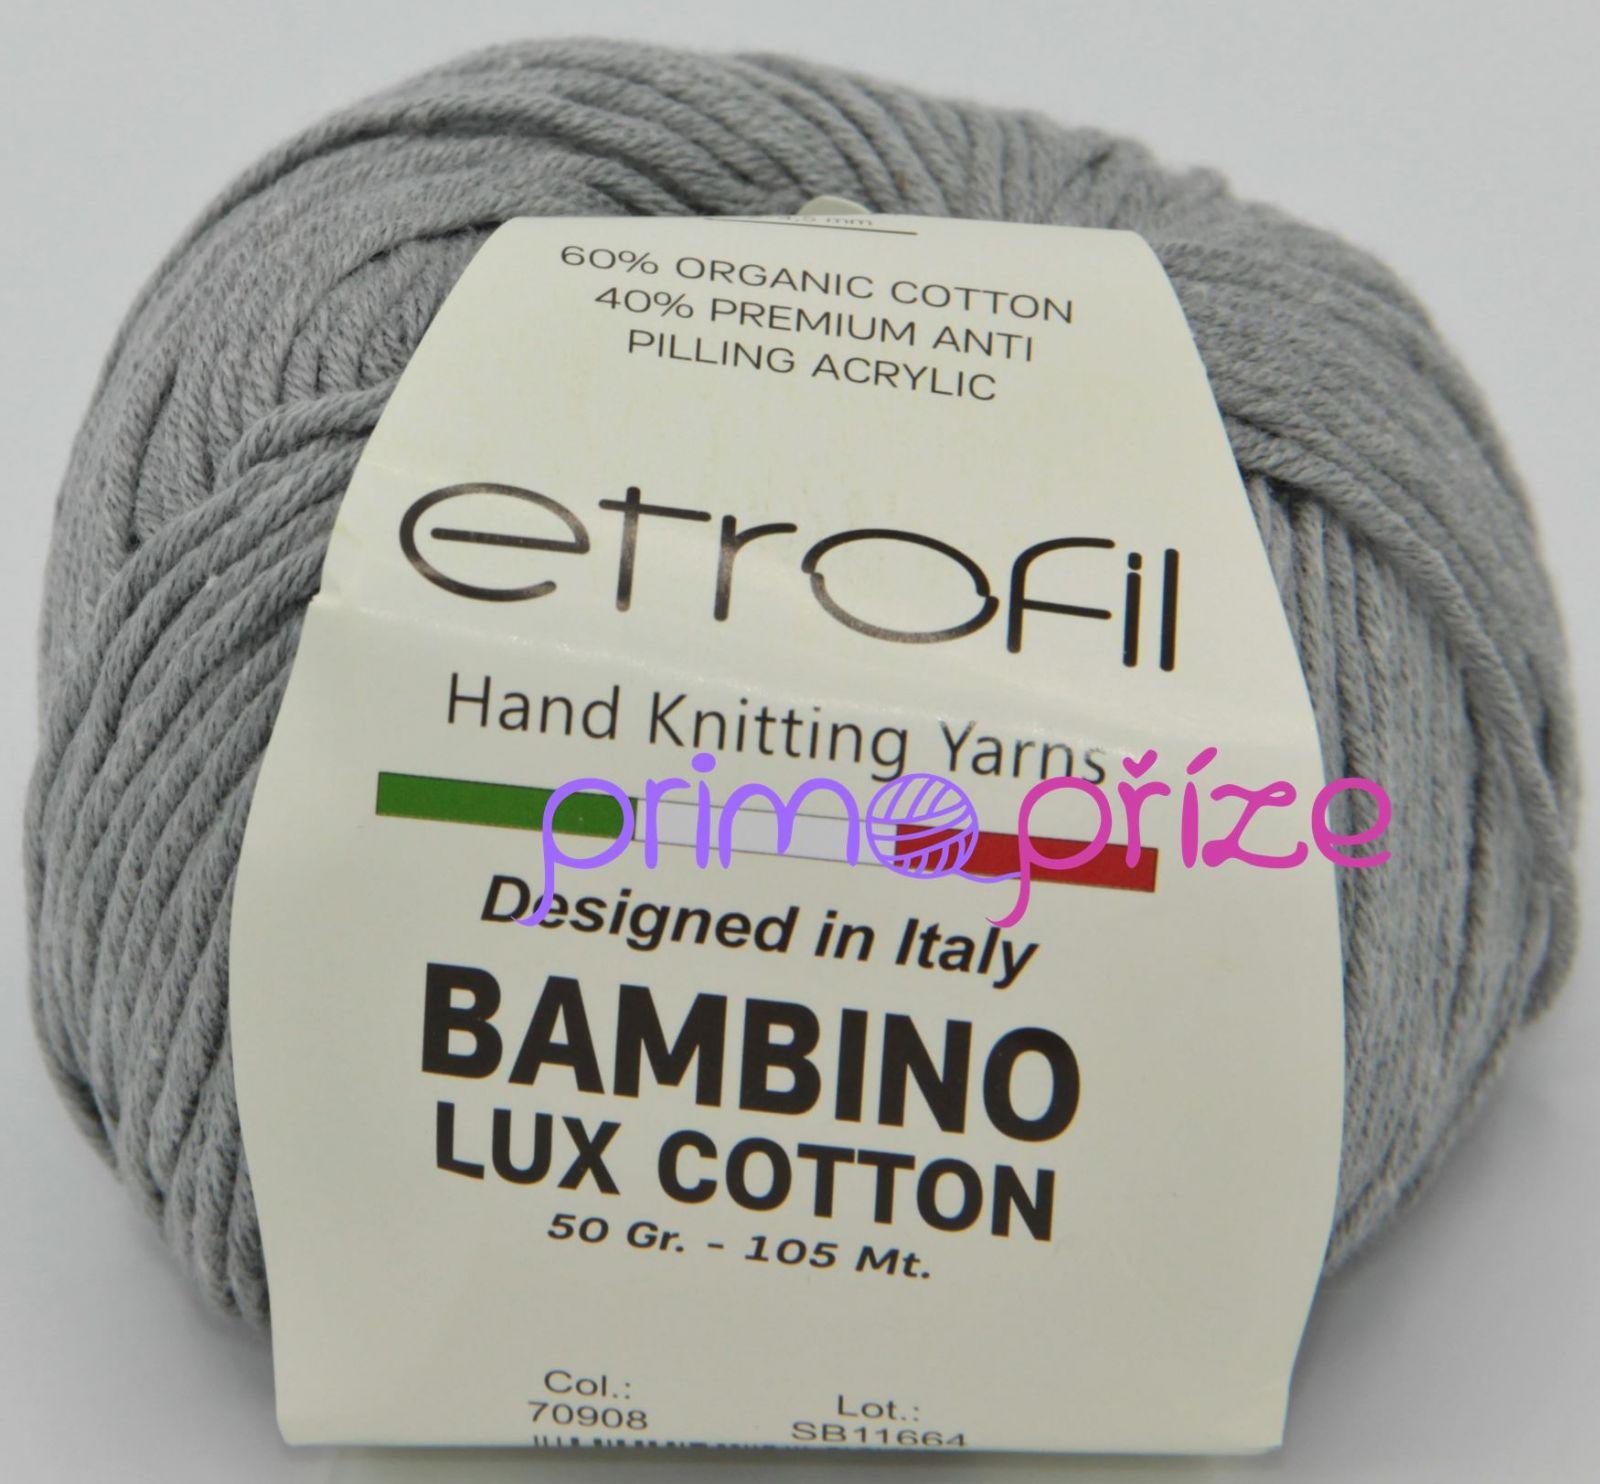 ETROFIL Bambino Lux Cotton 70908 šedá